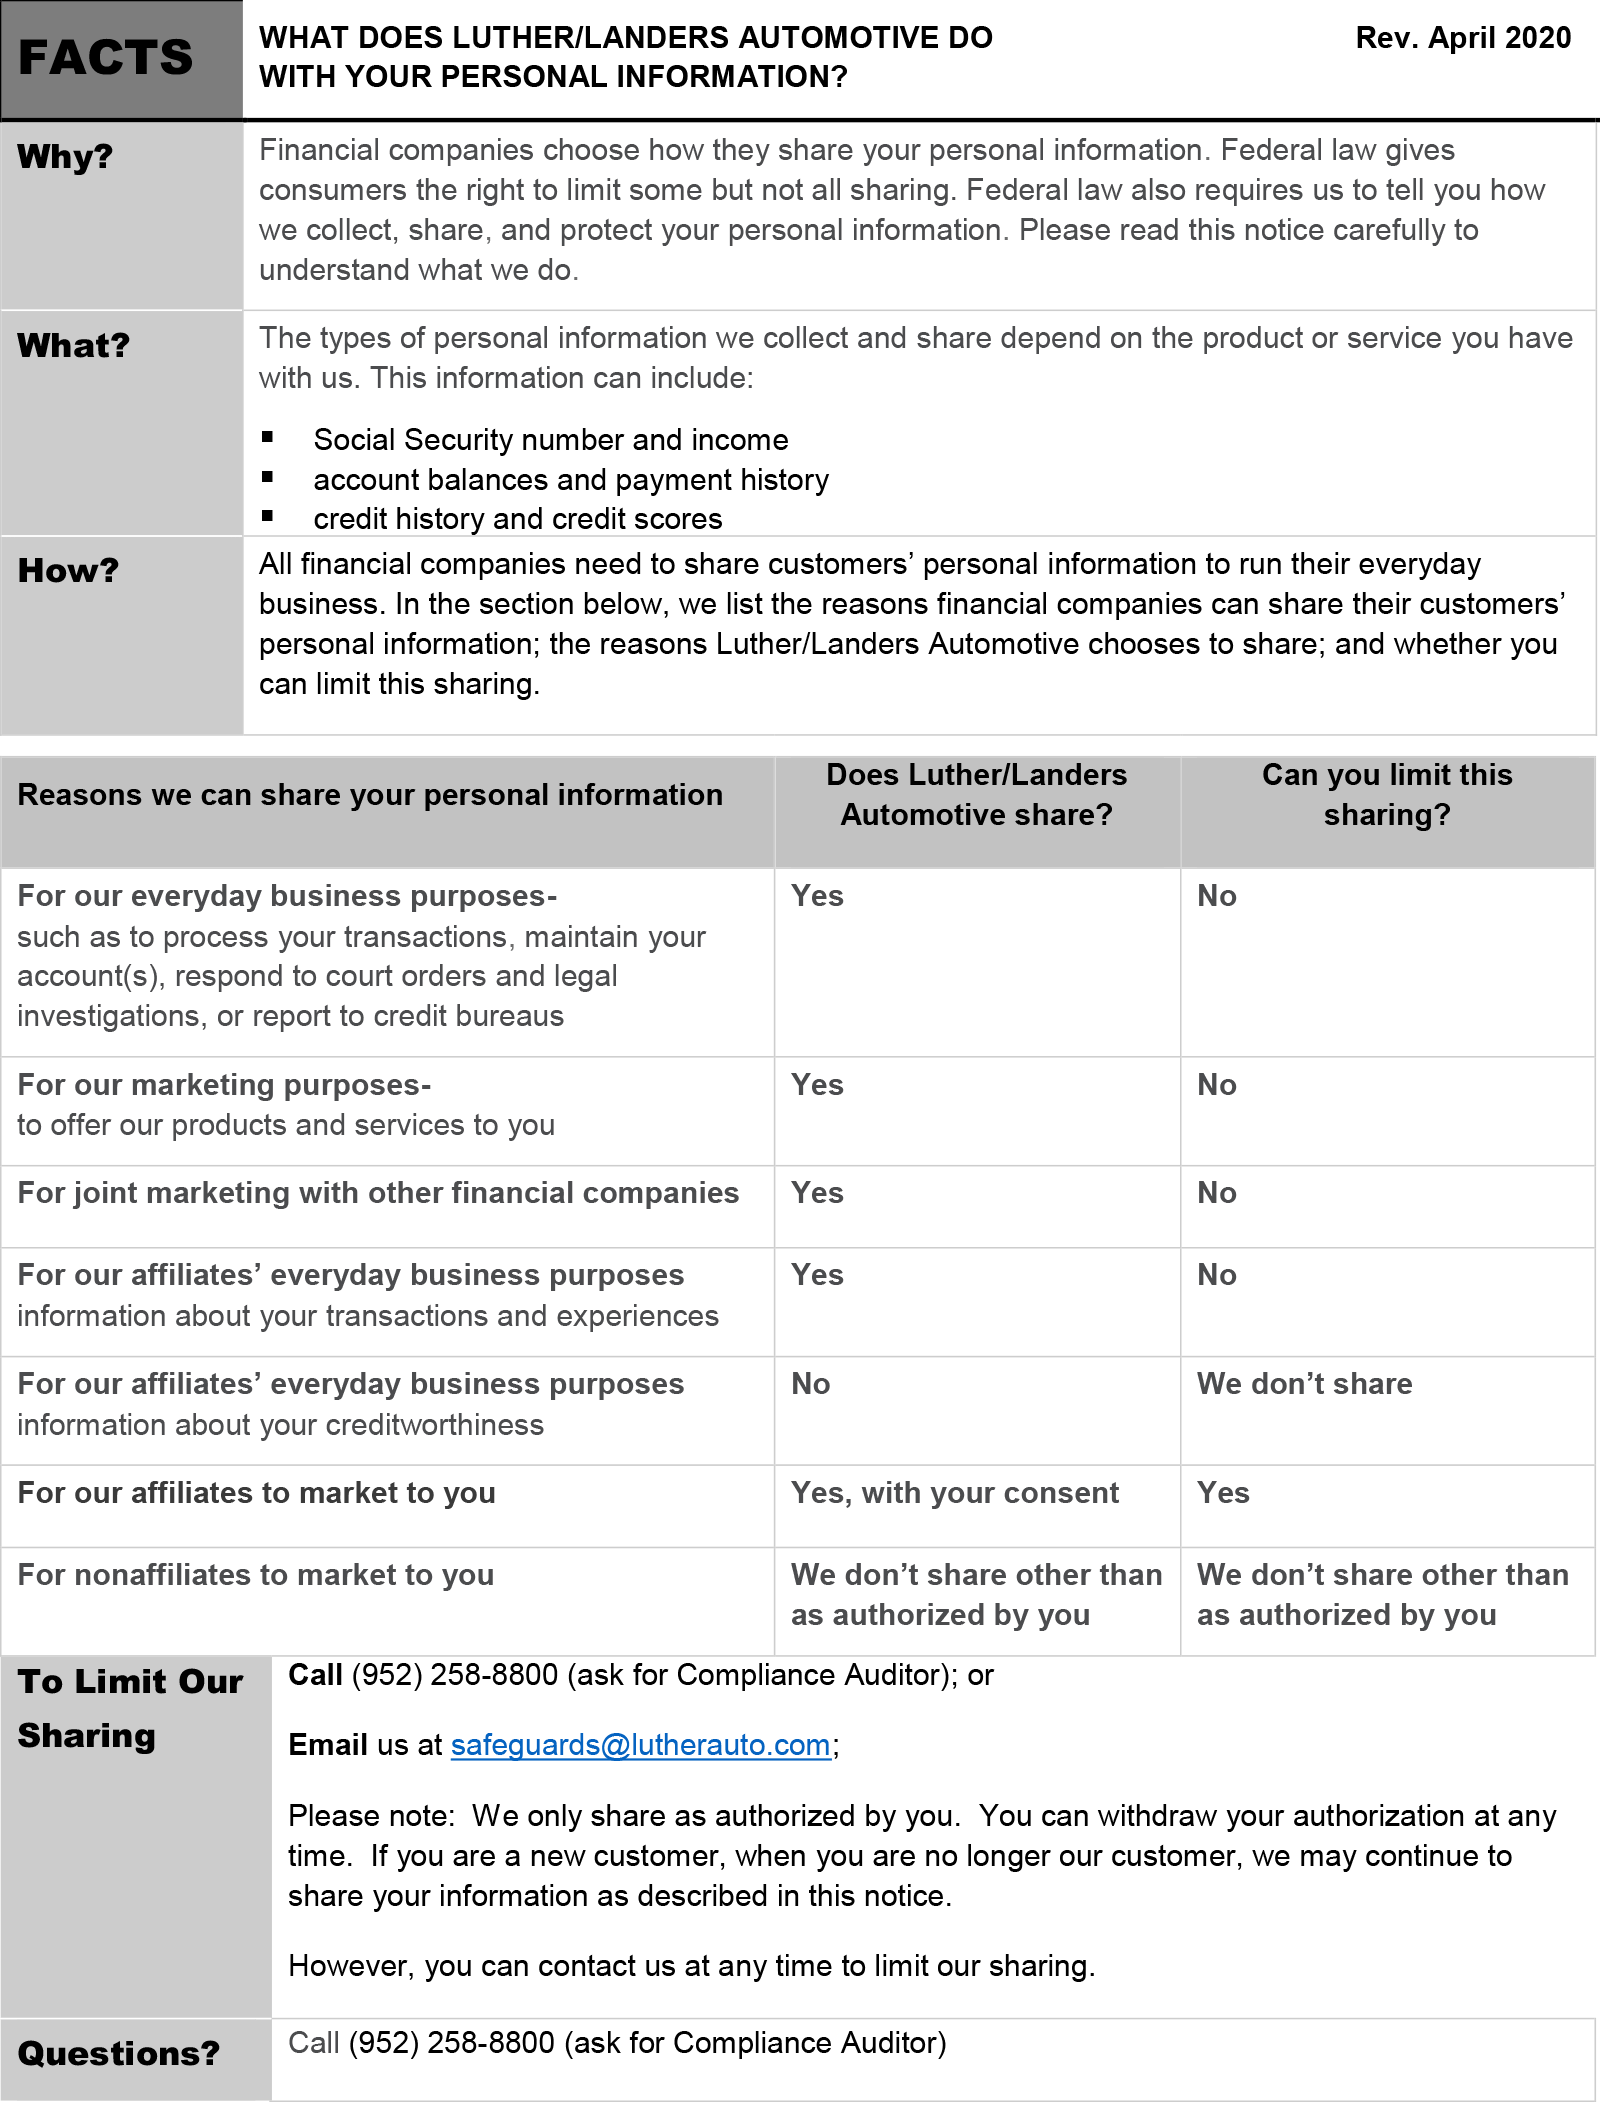 Financial-Notice-April-2020-Page-1-Luther-Landers-Automotive-